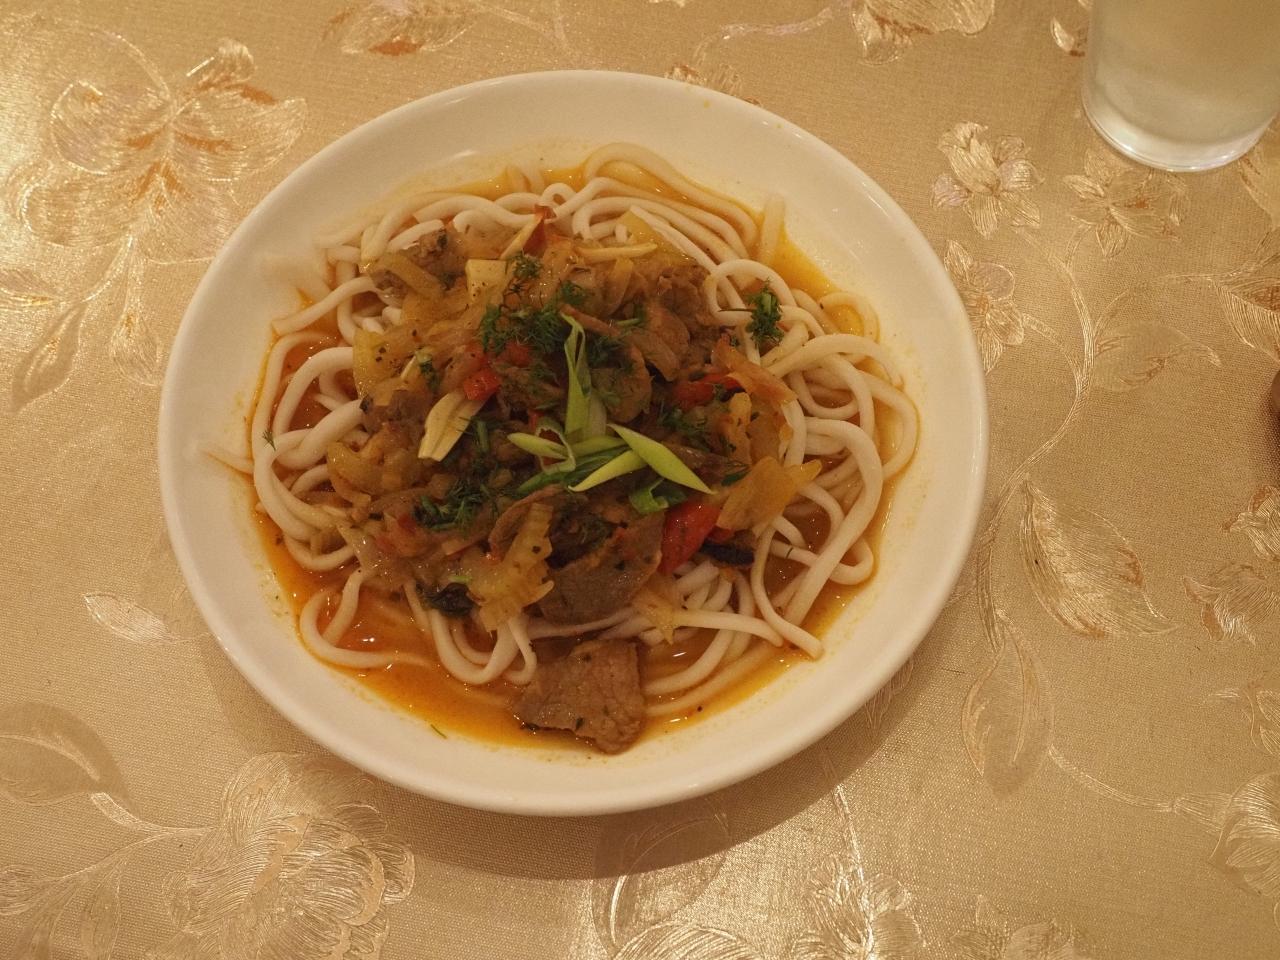 Lagman, from a neighborhood Uyghur restaurant